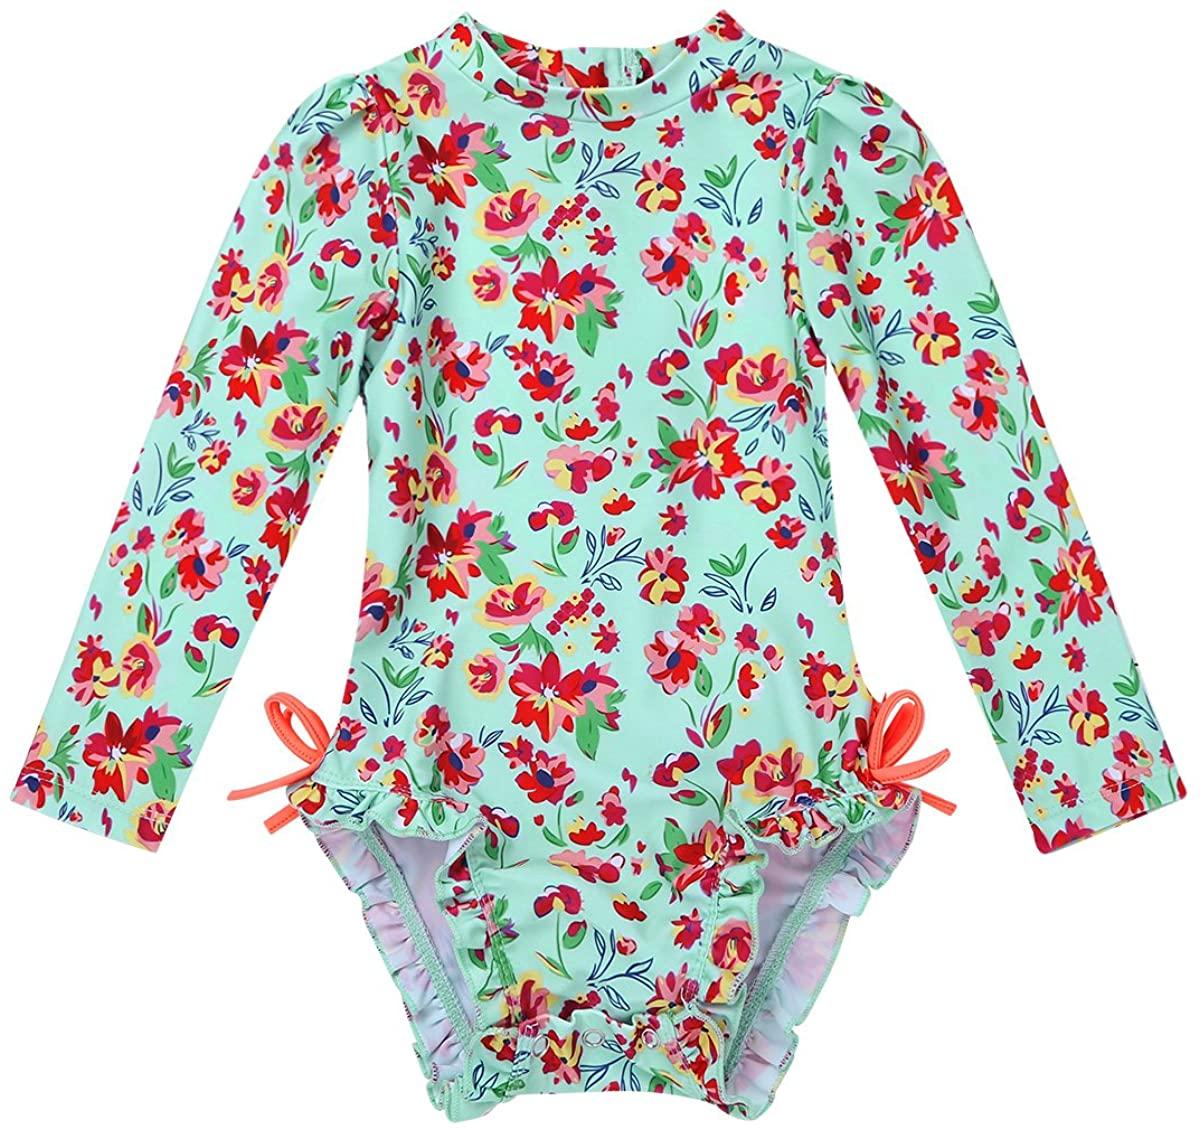 JEATHA Infant Baby Girls Ruffled Long Sleeves Rash Guard Floral Printed Bathing Suit Swimwear with Hidden Zipper Back